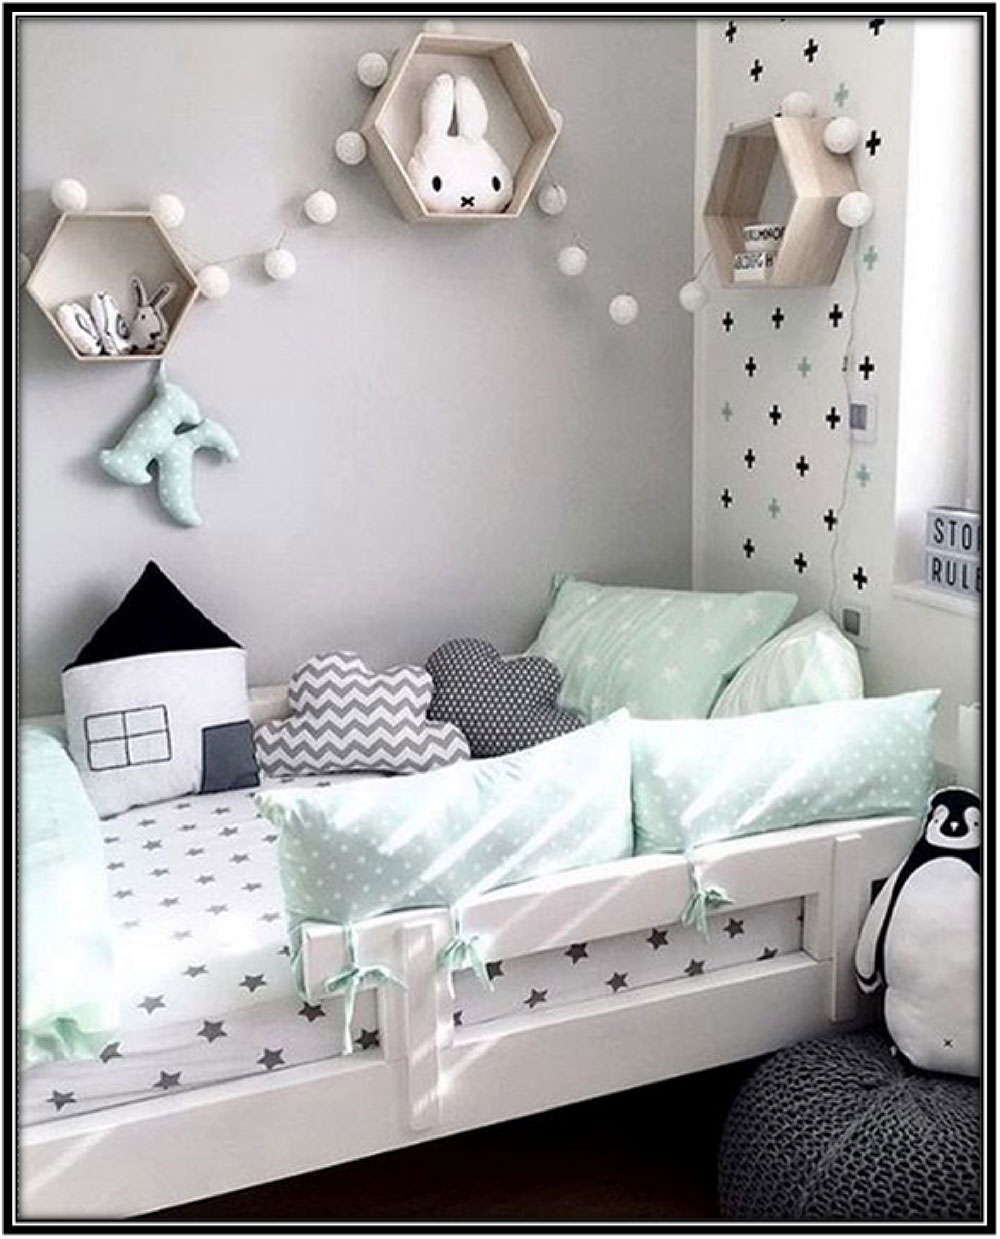 Hexagonal wall hangings - Home decor ideas